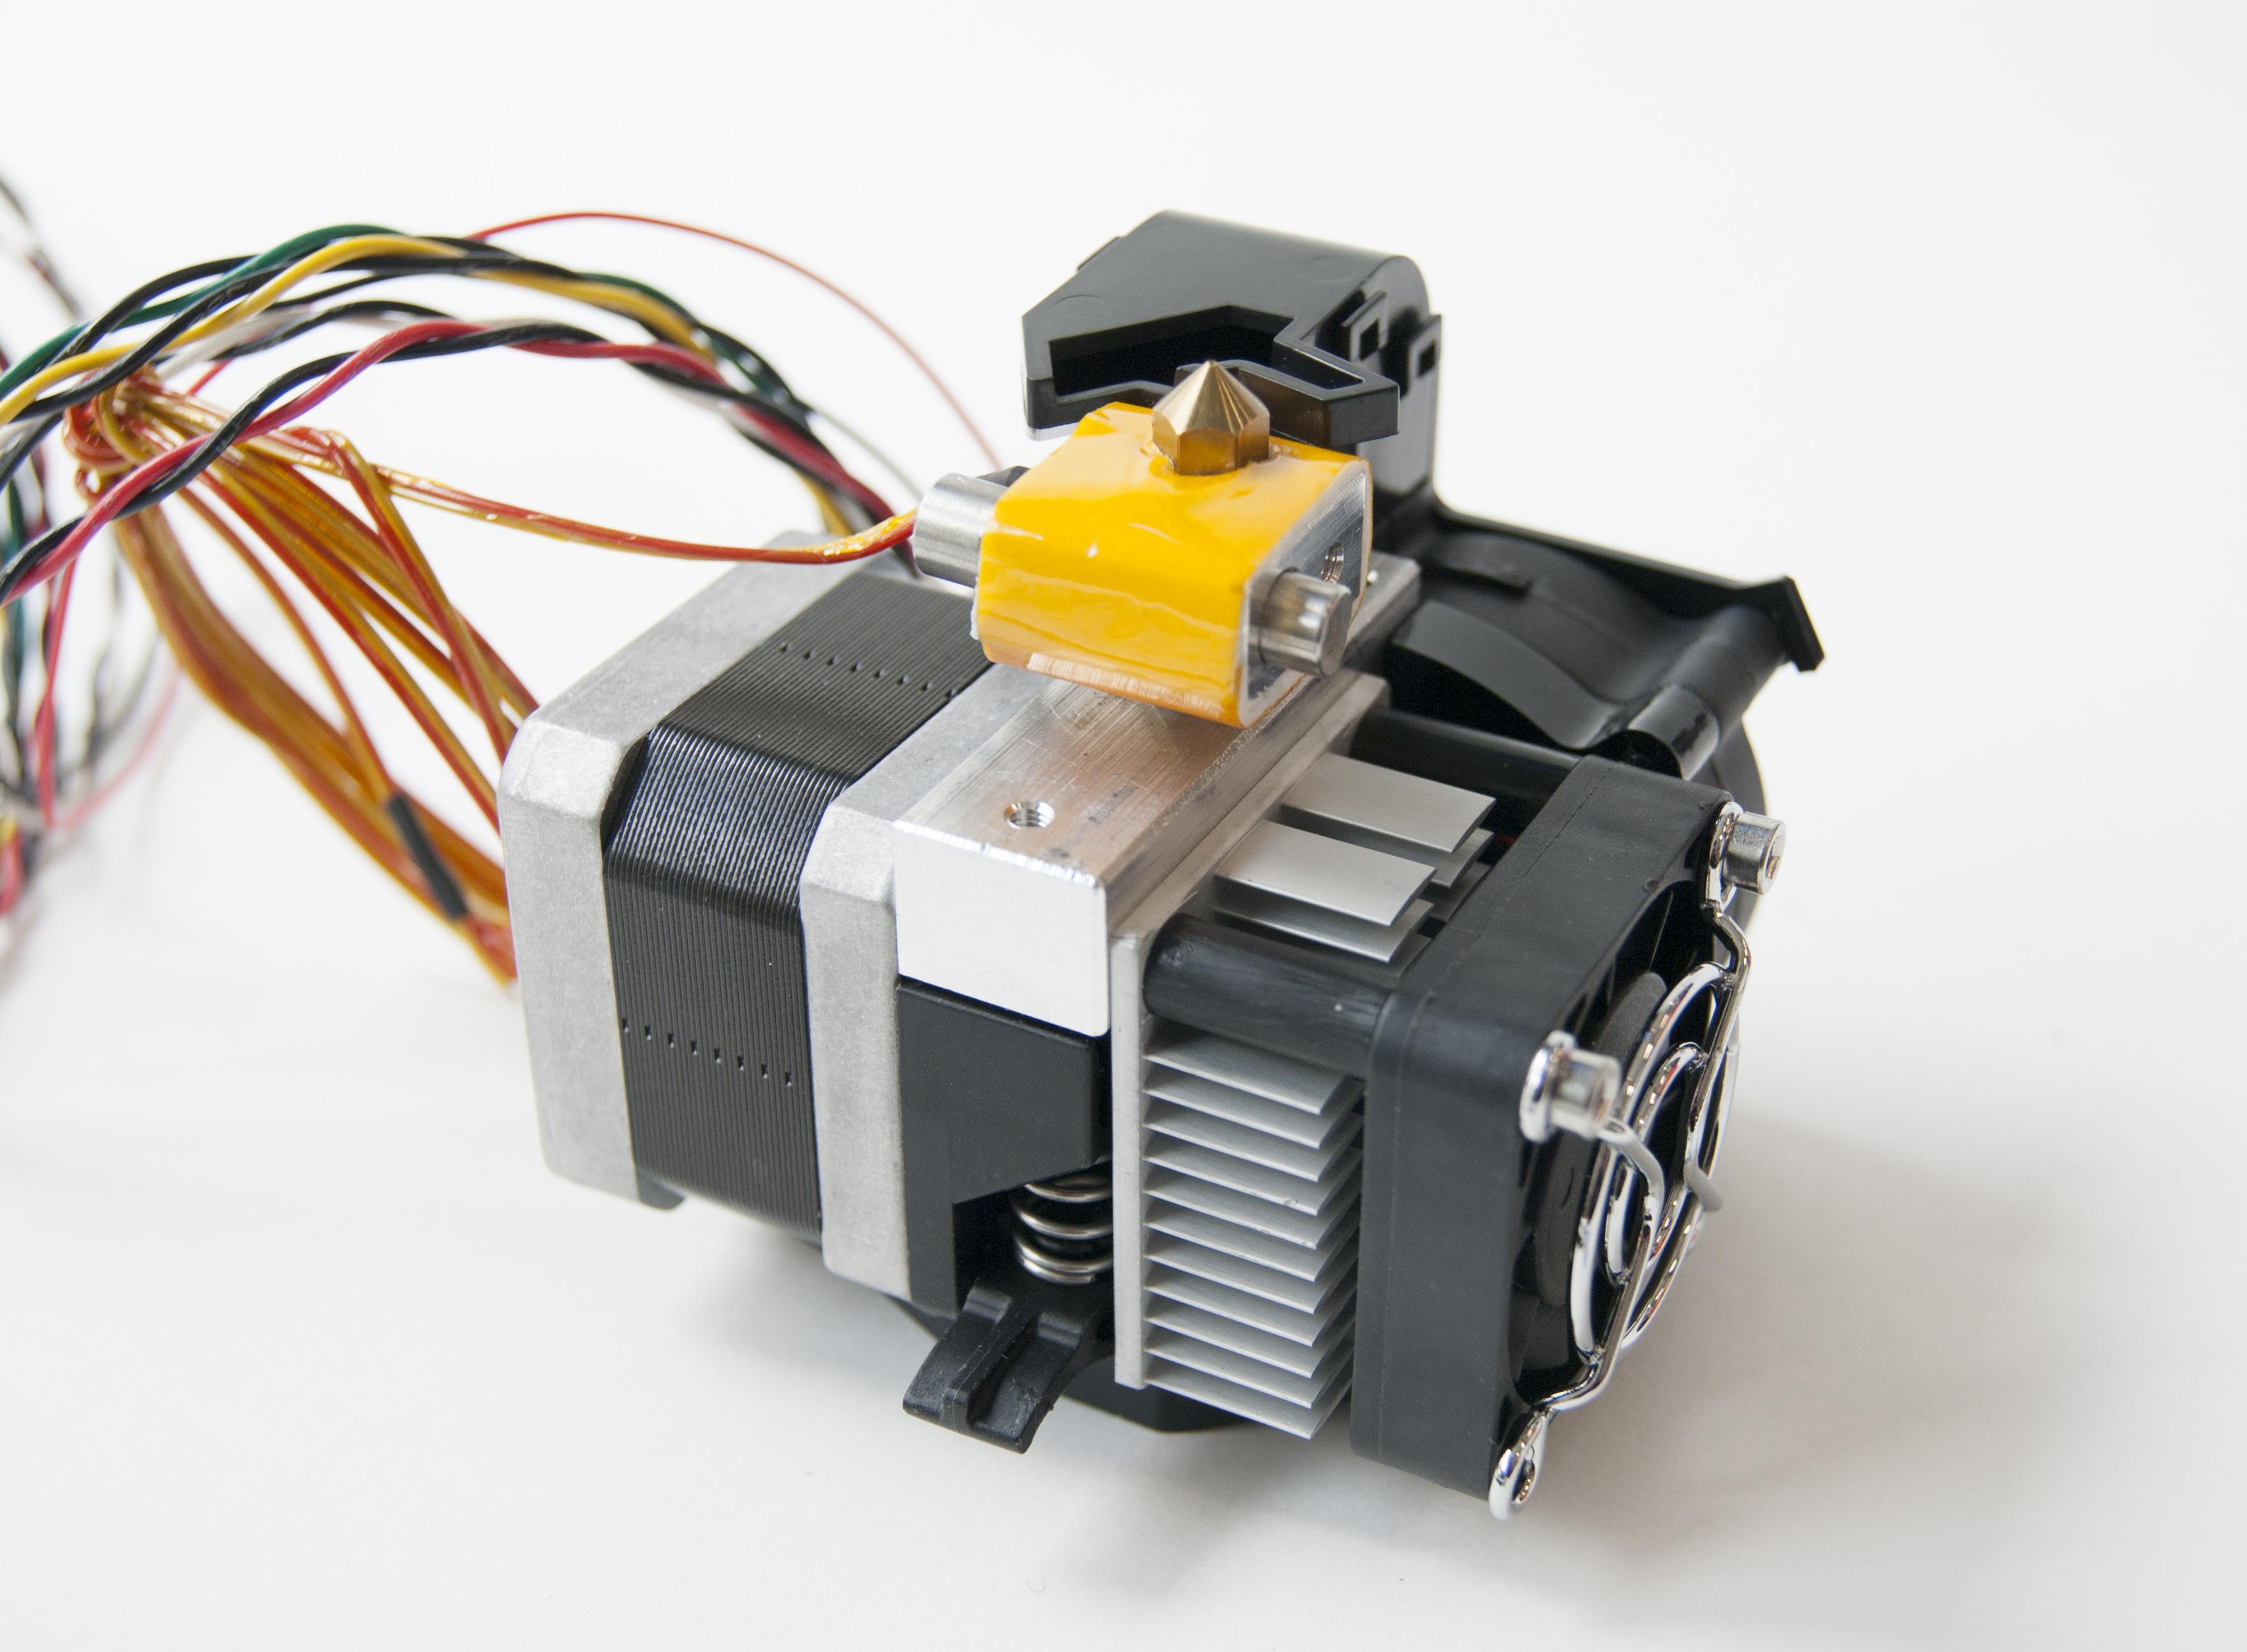 https://www.machines-3d.com/ventilateur-pour-makerbot-replicator-ou Makerbot Wiring Diagram on